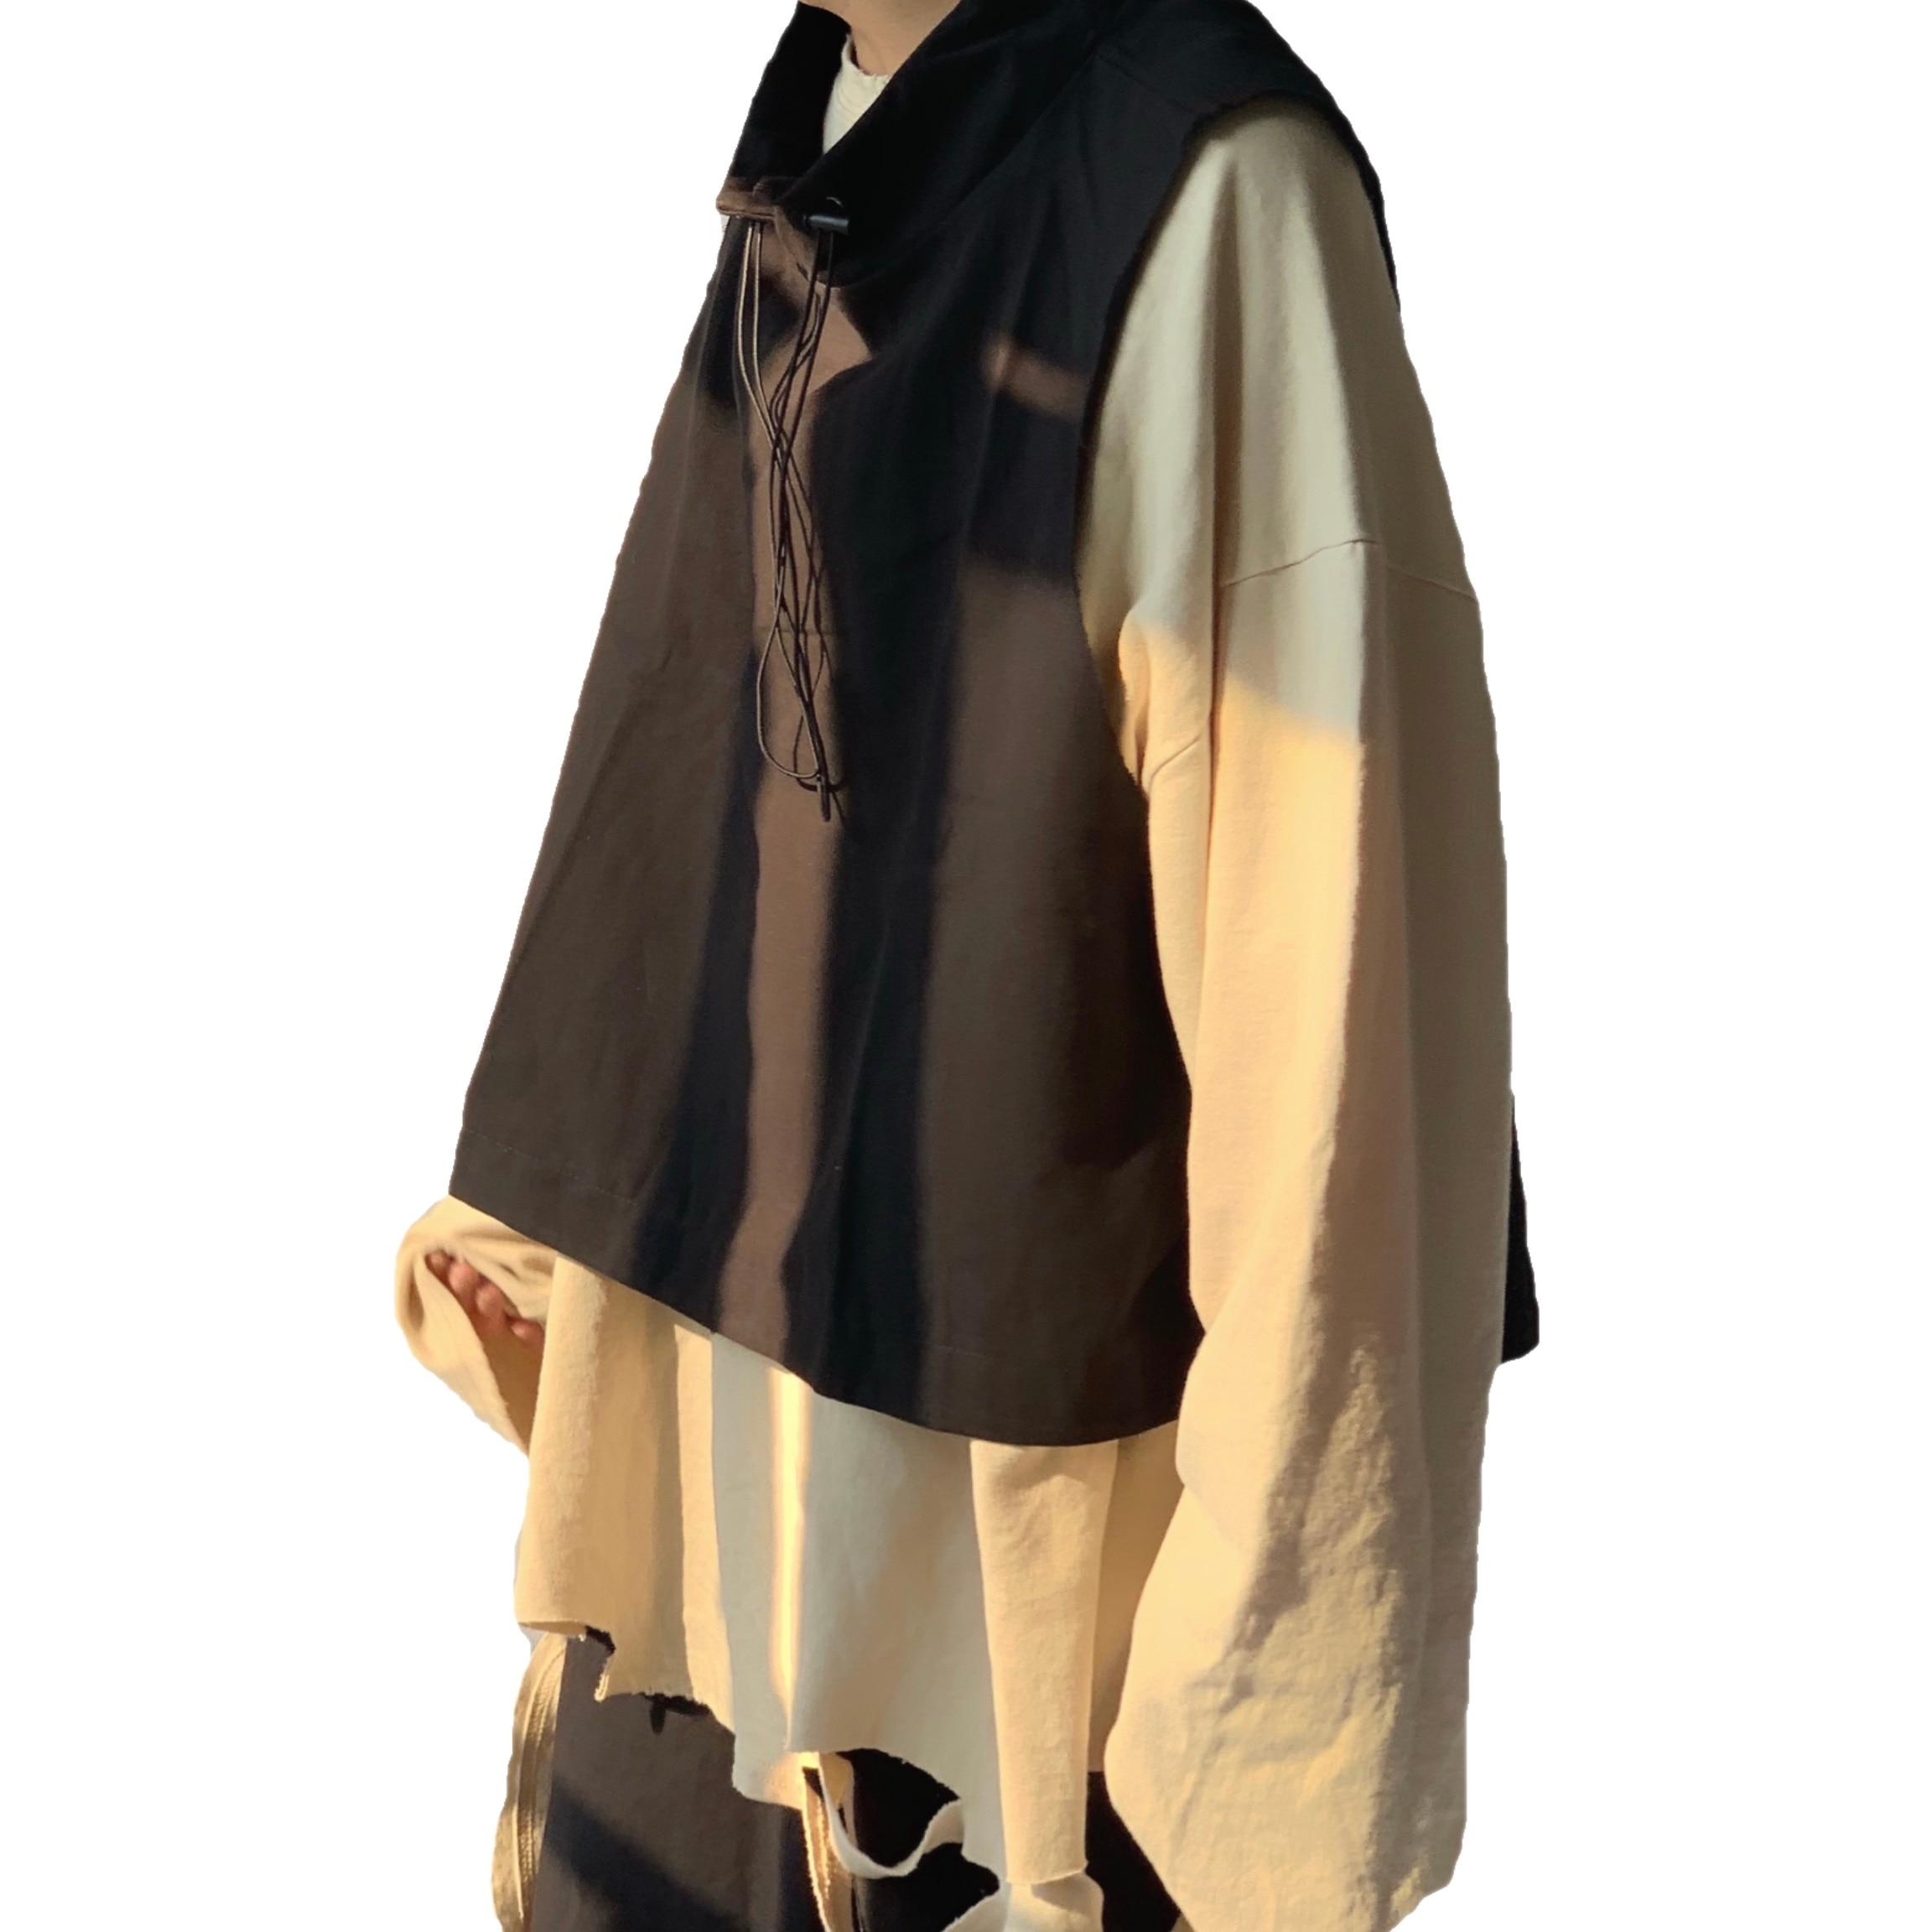 Hip Hop Sleeveless Vests Men Women Functional Tactical Drawstring Vest 2020 New Streetwear Black Pullover Loose Vest Sweatshirts